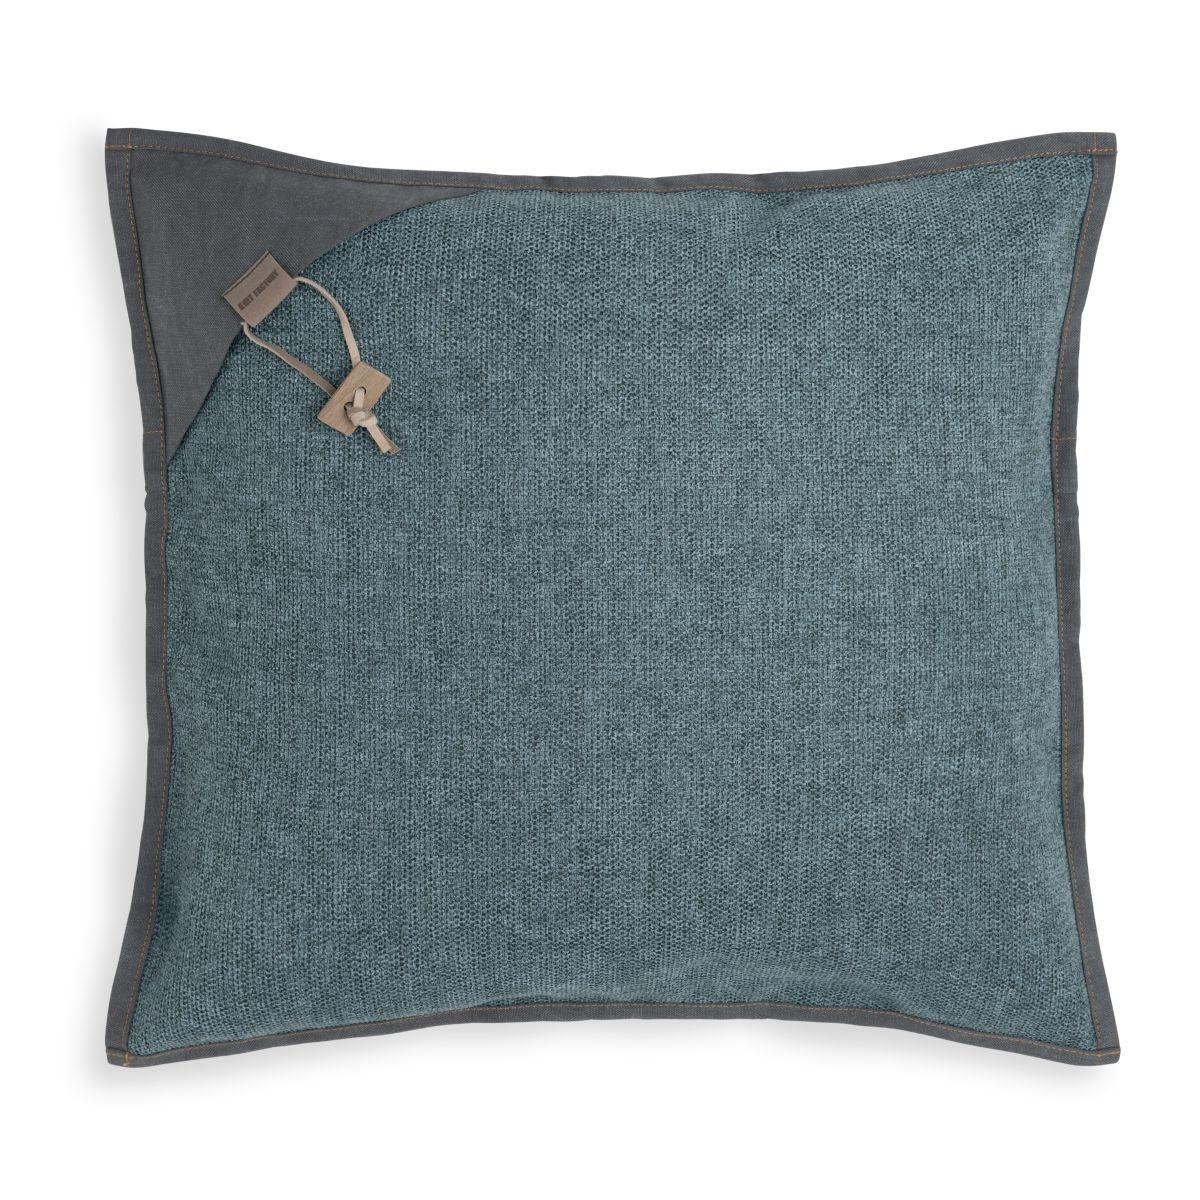 knit factory kf154012013 hope kussen jeans 50x50 1